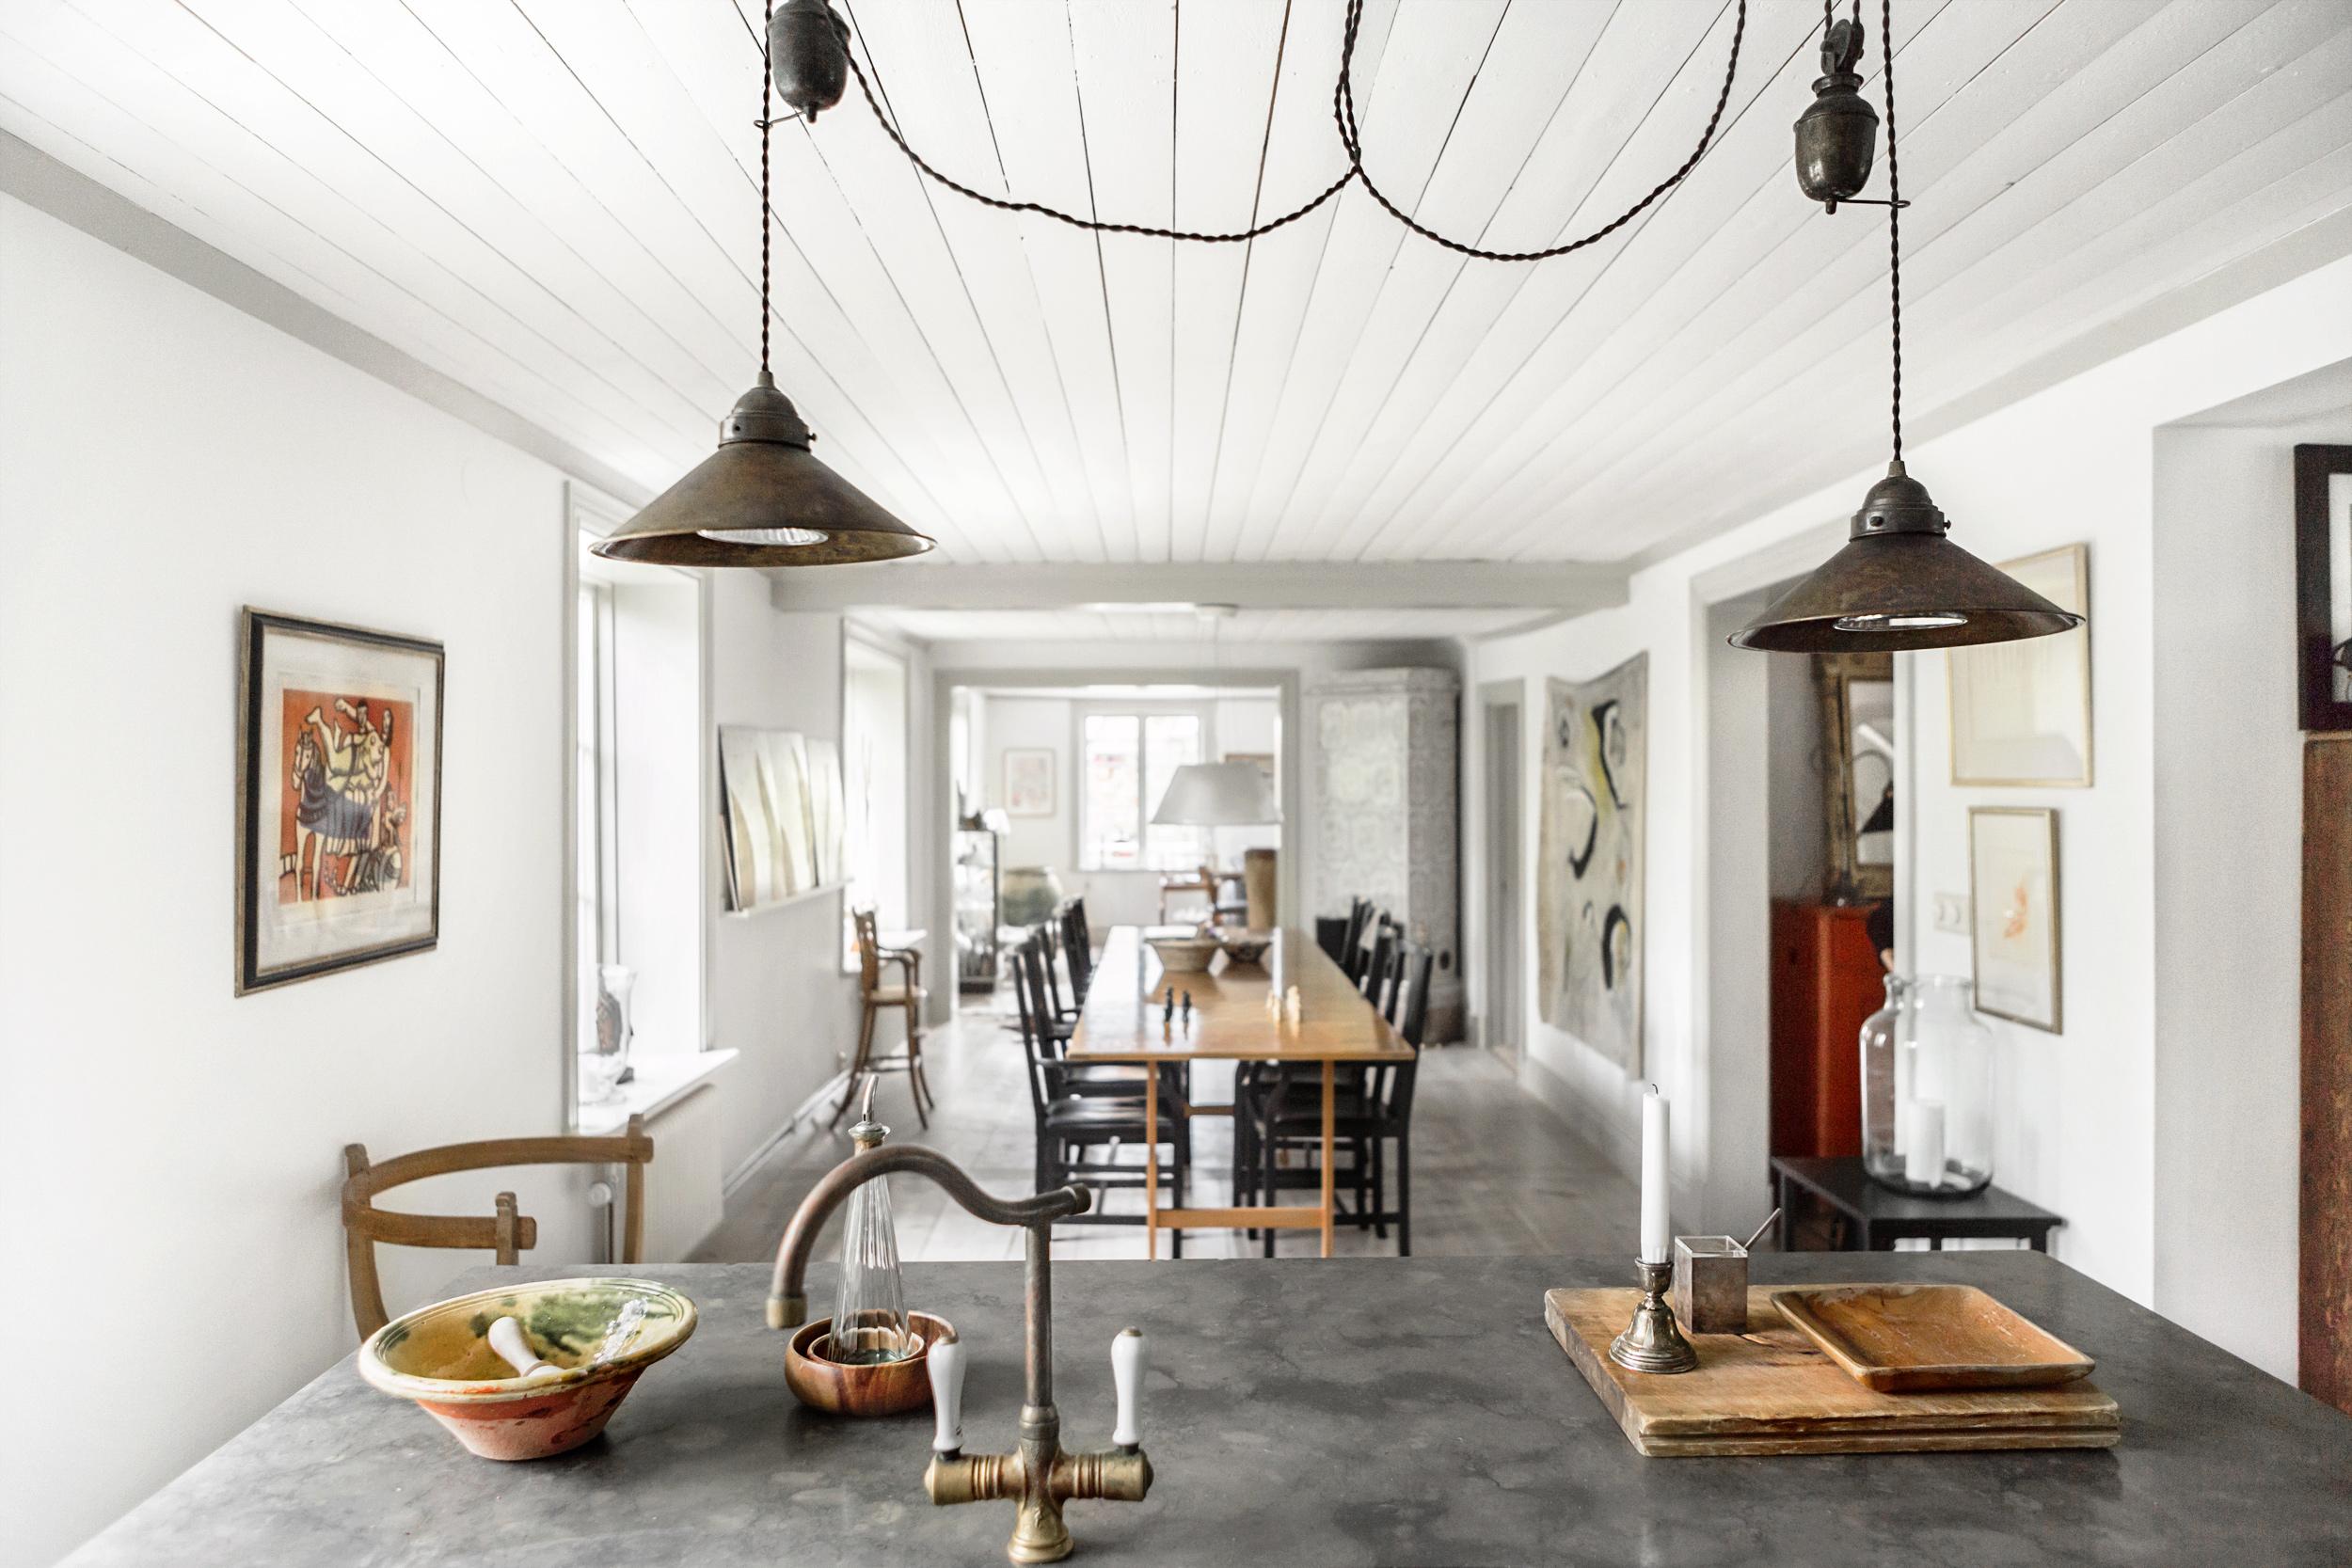 1700 tals hus i Nacka copyright 2017  Anna  Malmberg 6